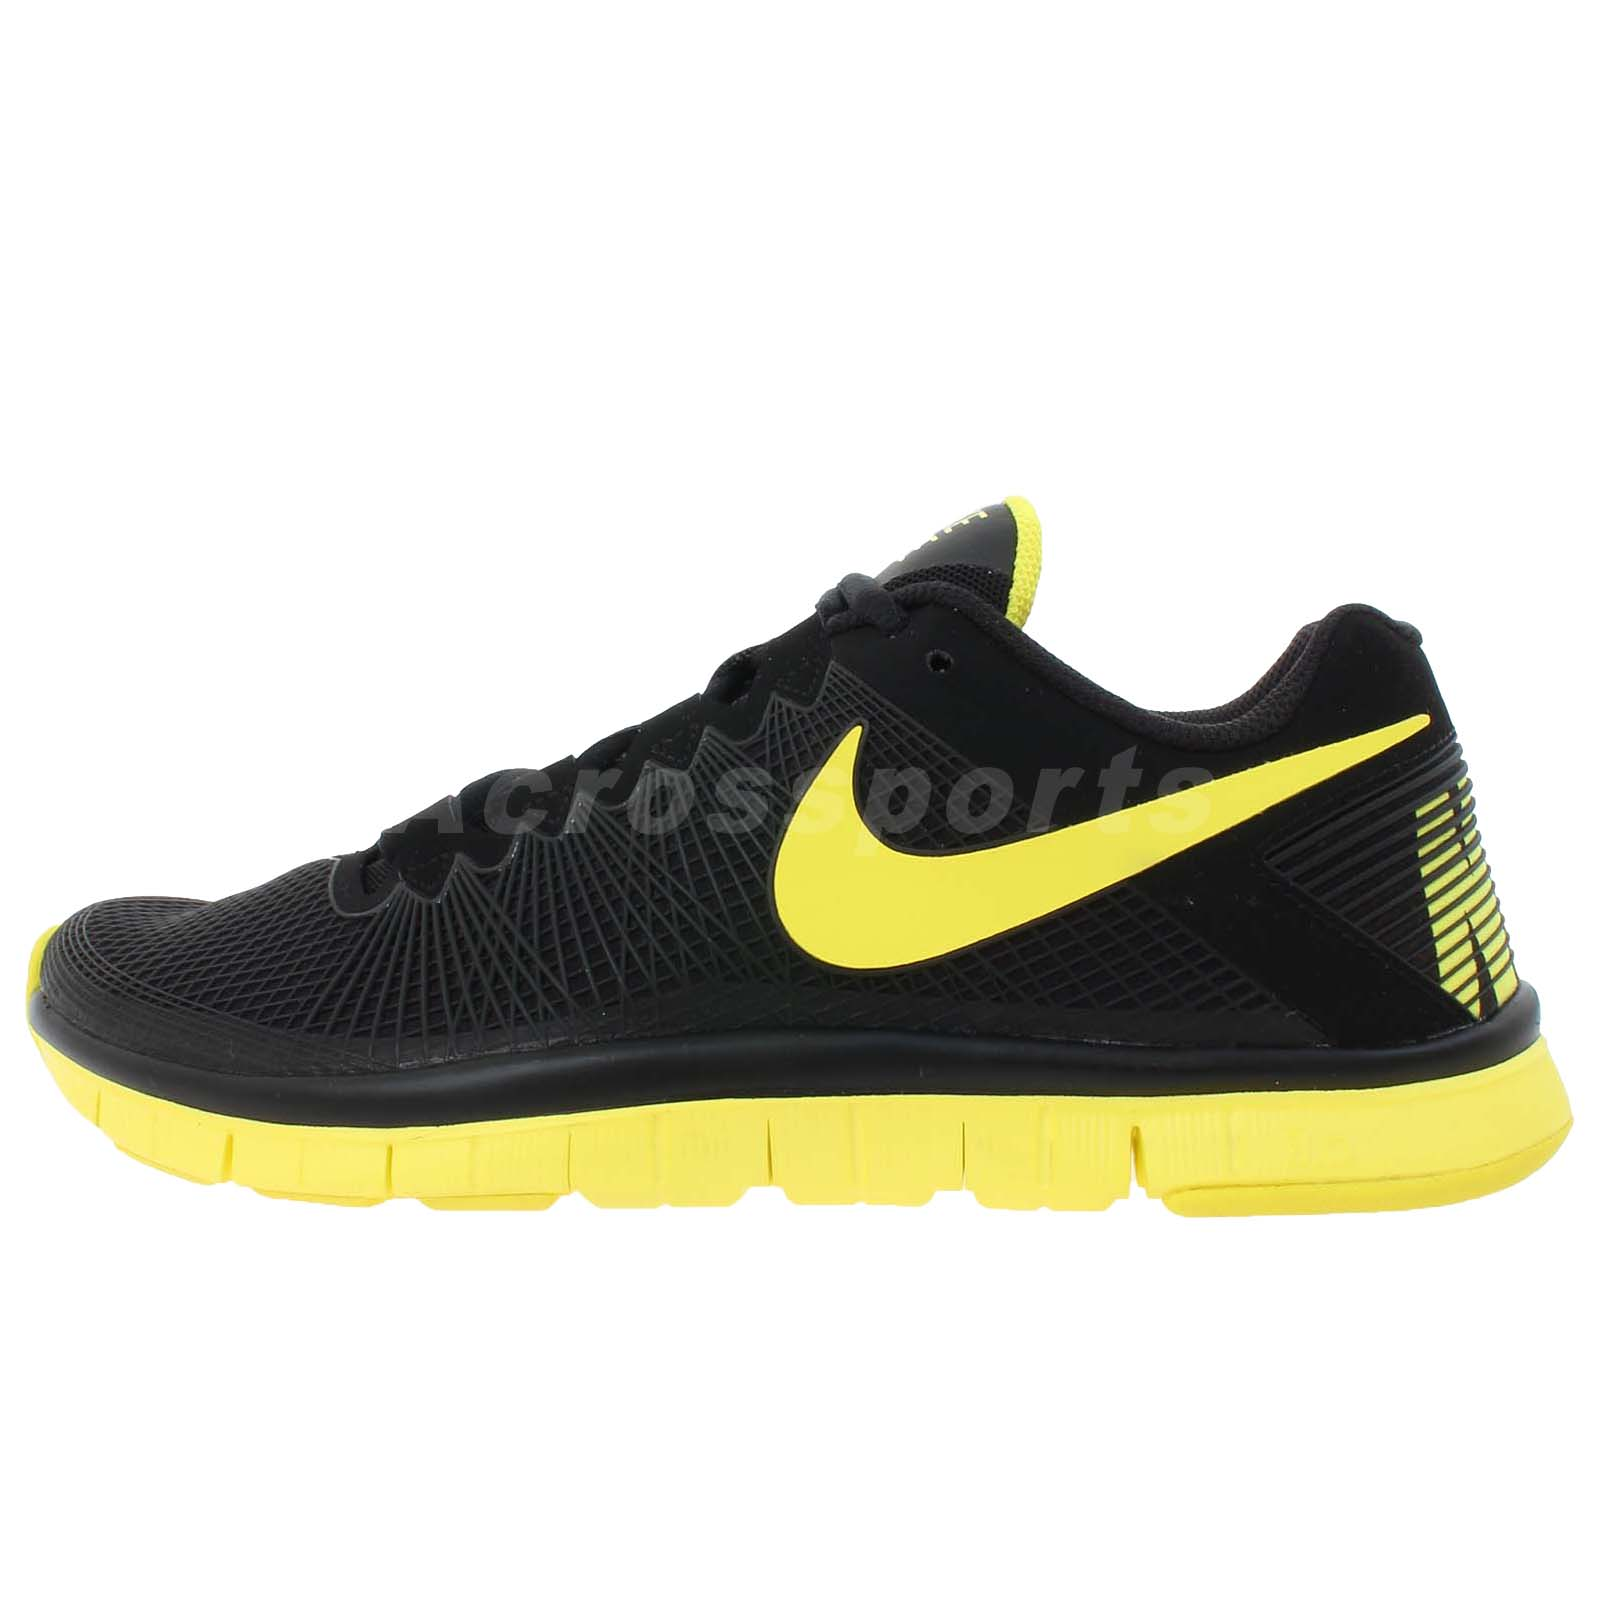 nike free trainer 3 0 2013 new mens cross training shoes. Black Bedroom Furniture Sets. Home Design Ideas